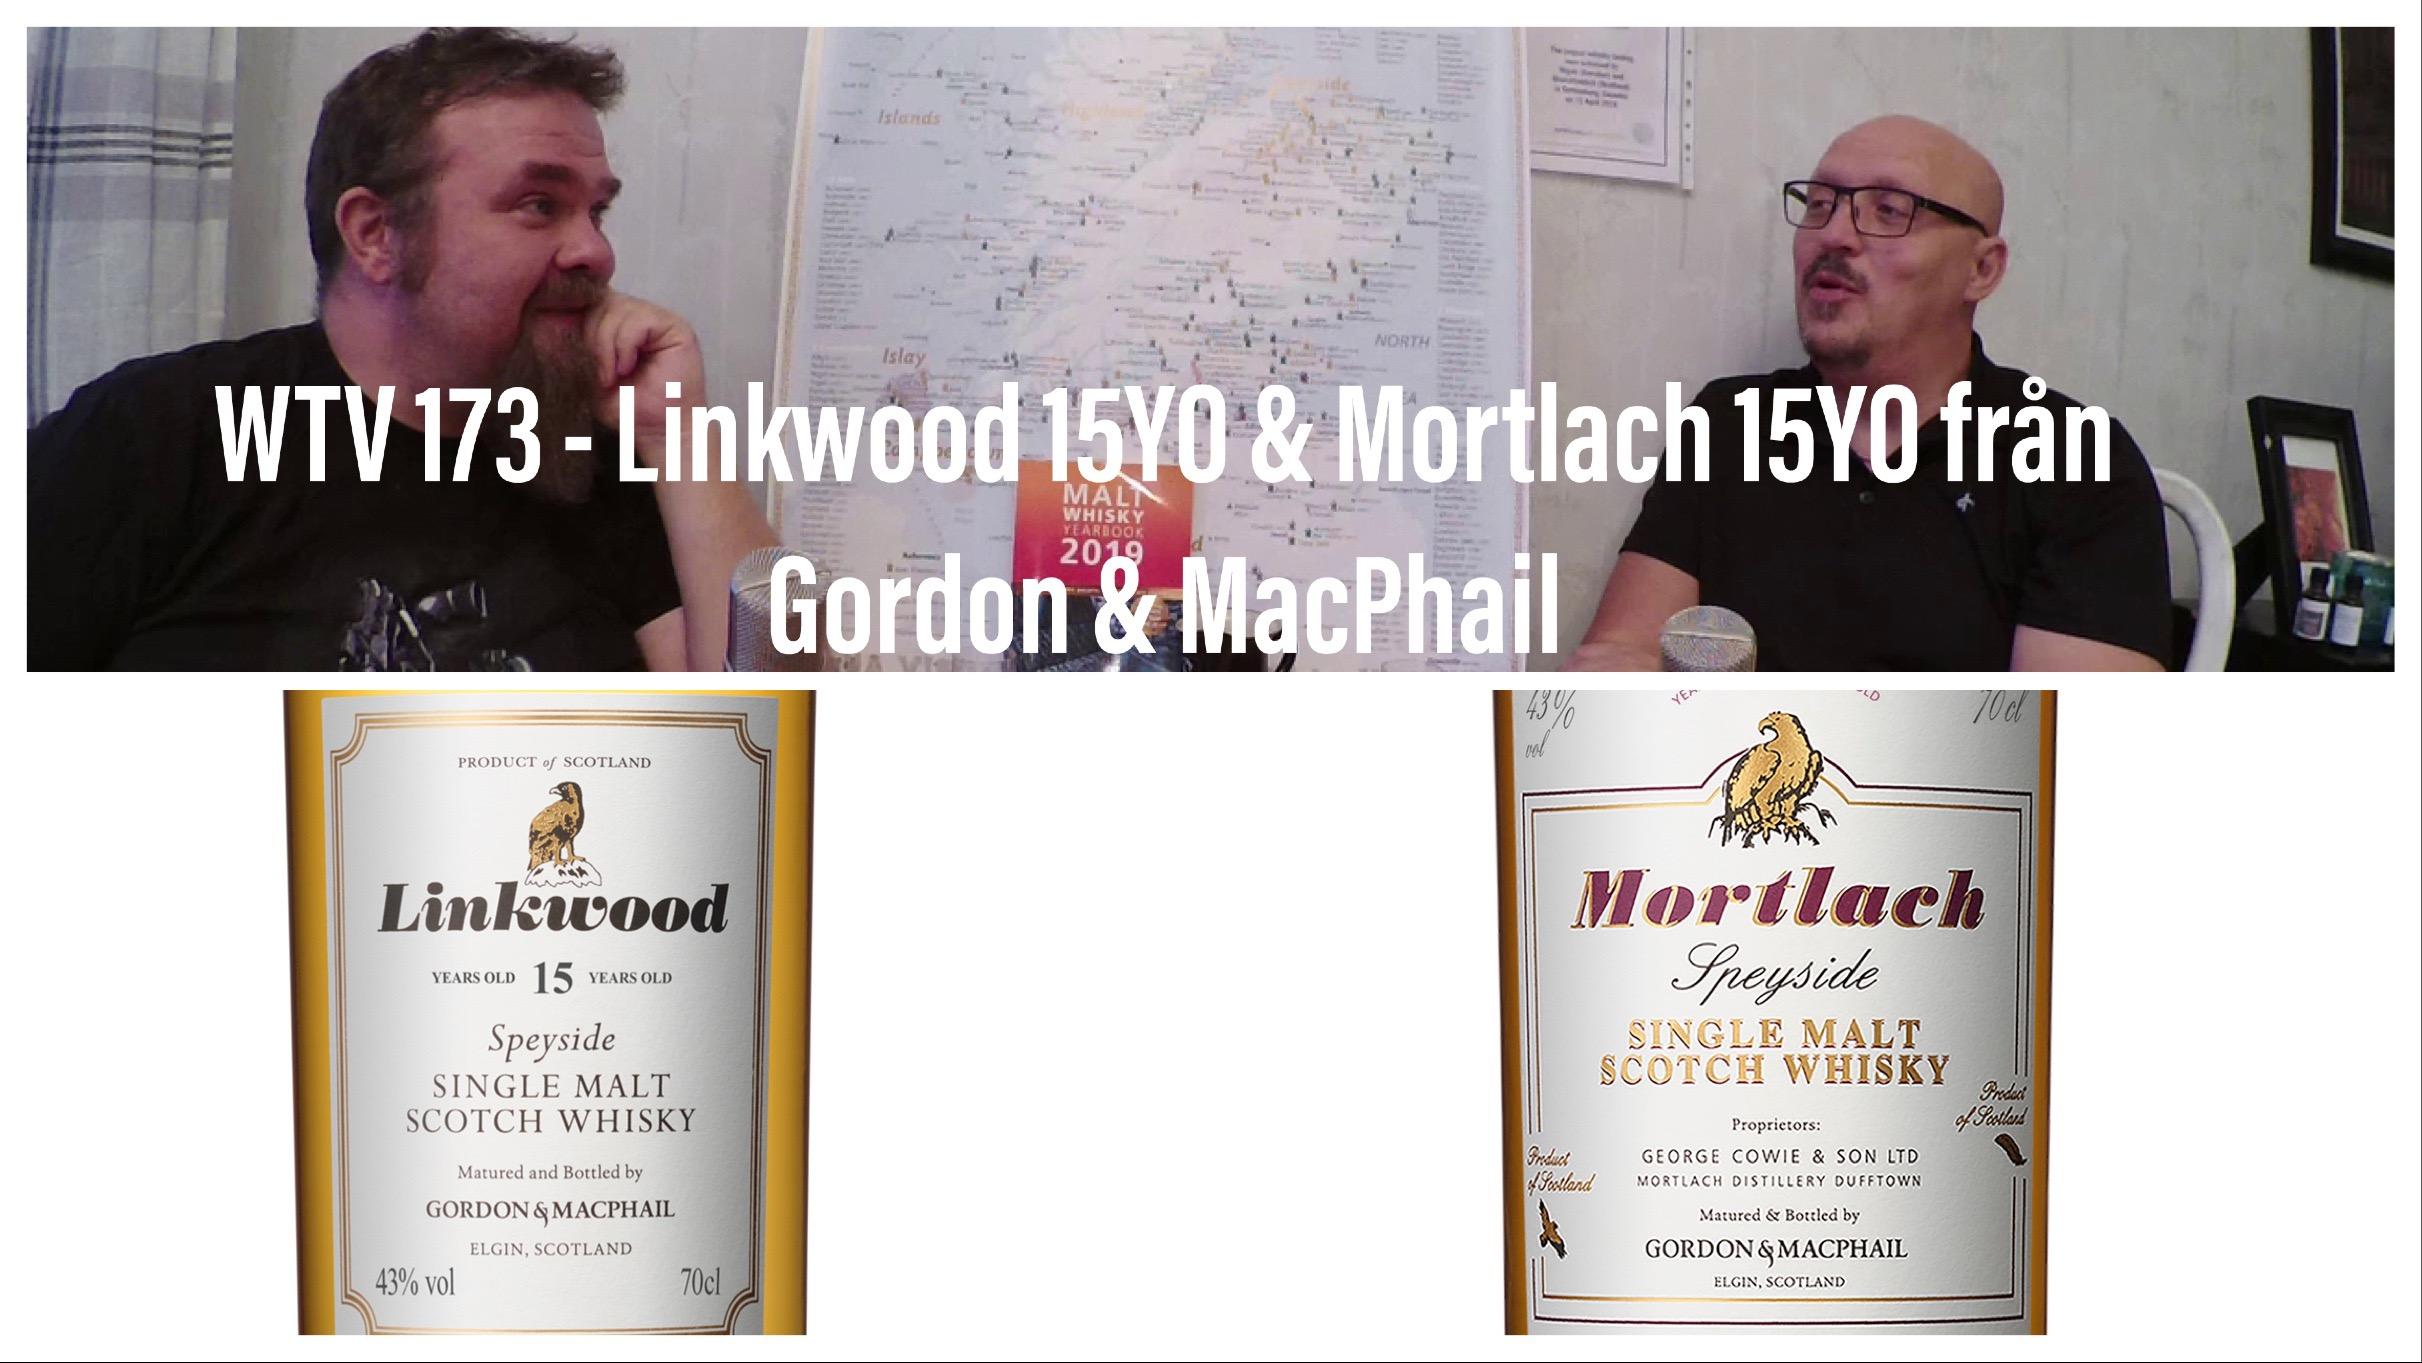 WTV 173 – Linkwood 15YO & Mortlach 15 YO från Gordon & MacPhail